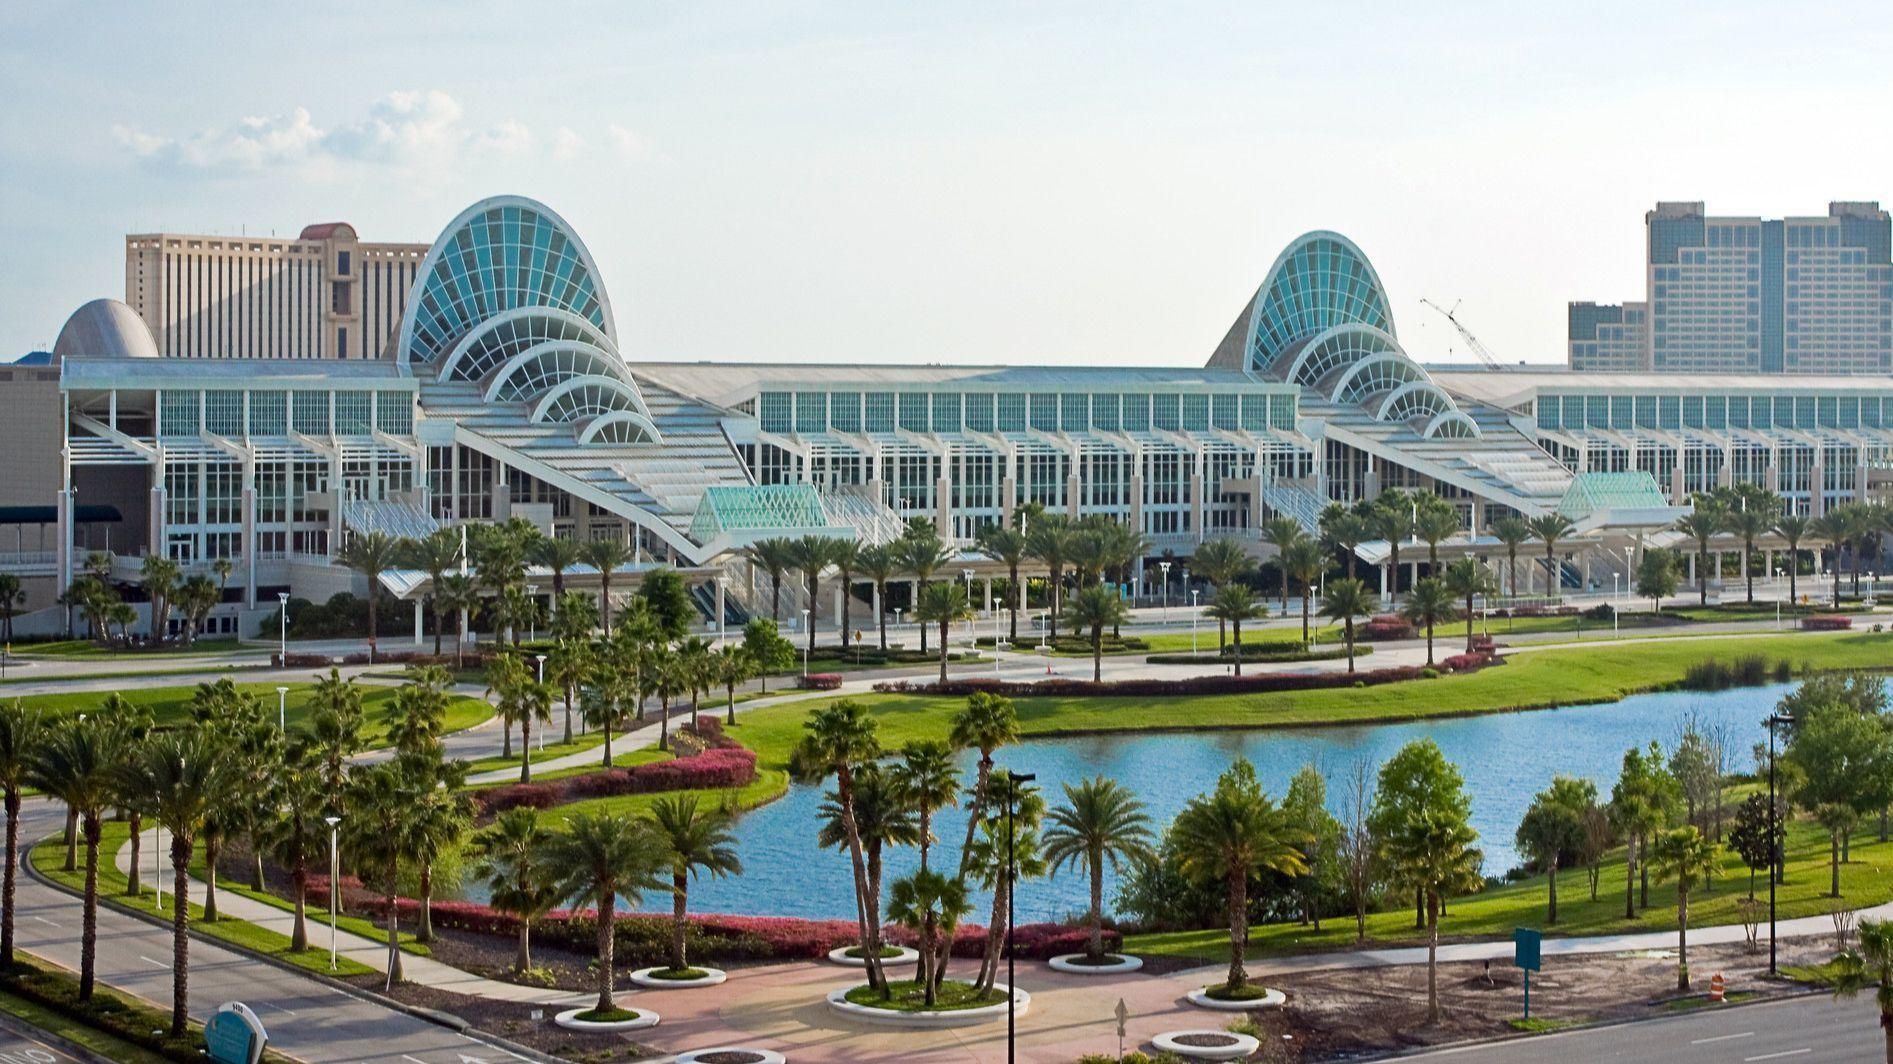 Orange County Convention Center Floor Plan: Orange County Convention Center Looks Ahead For Busy 2018